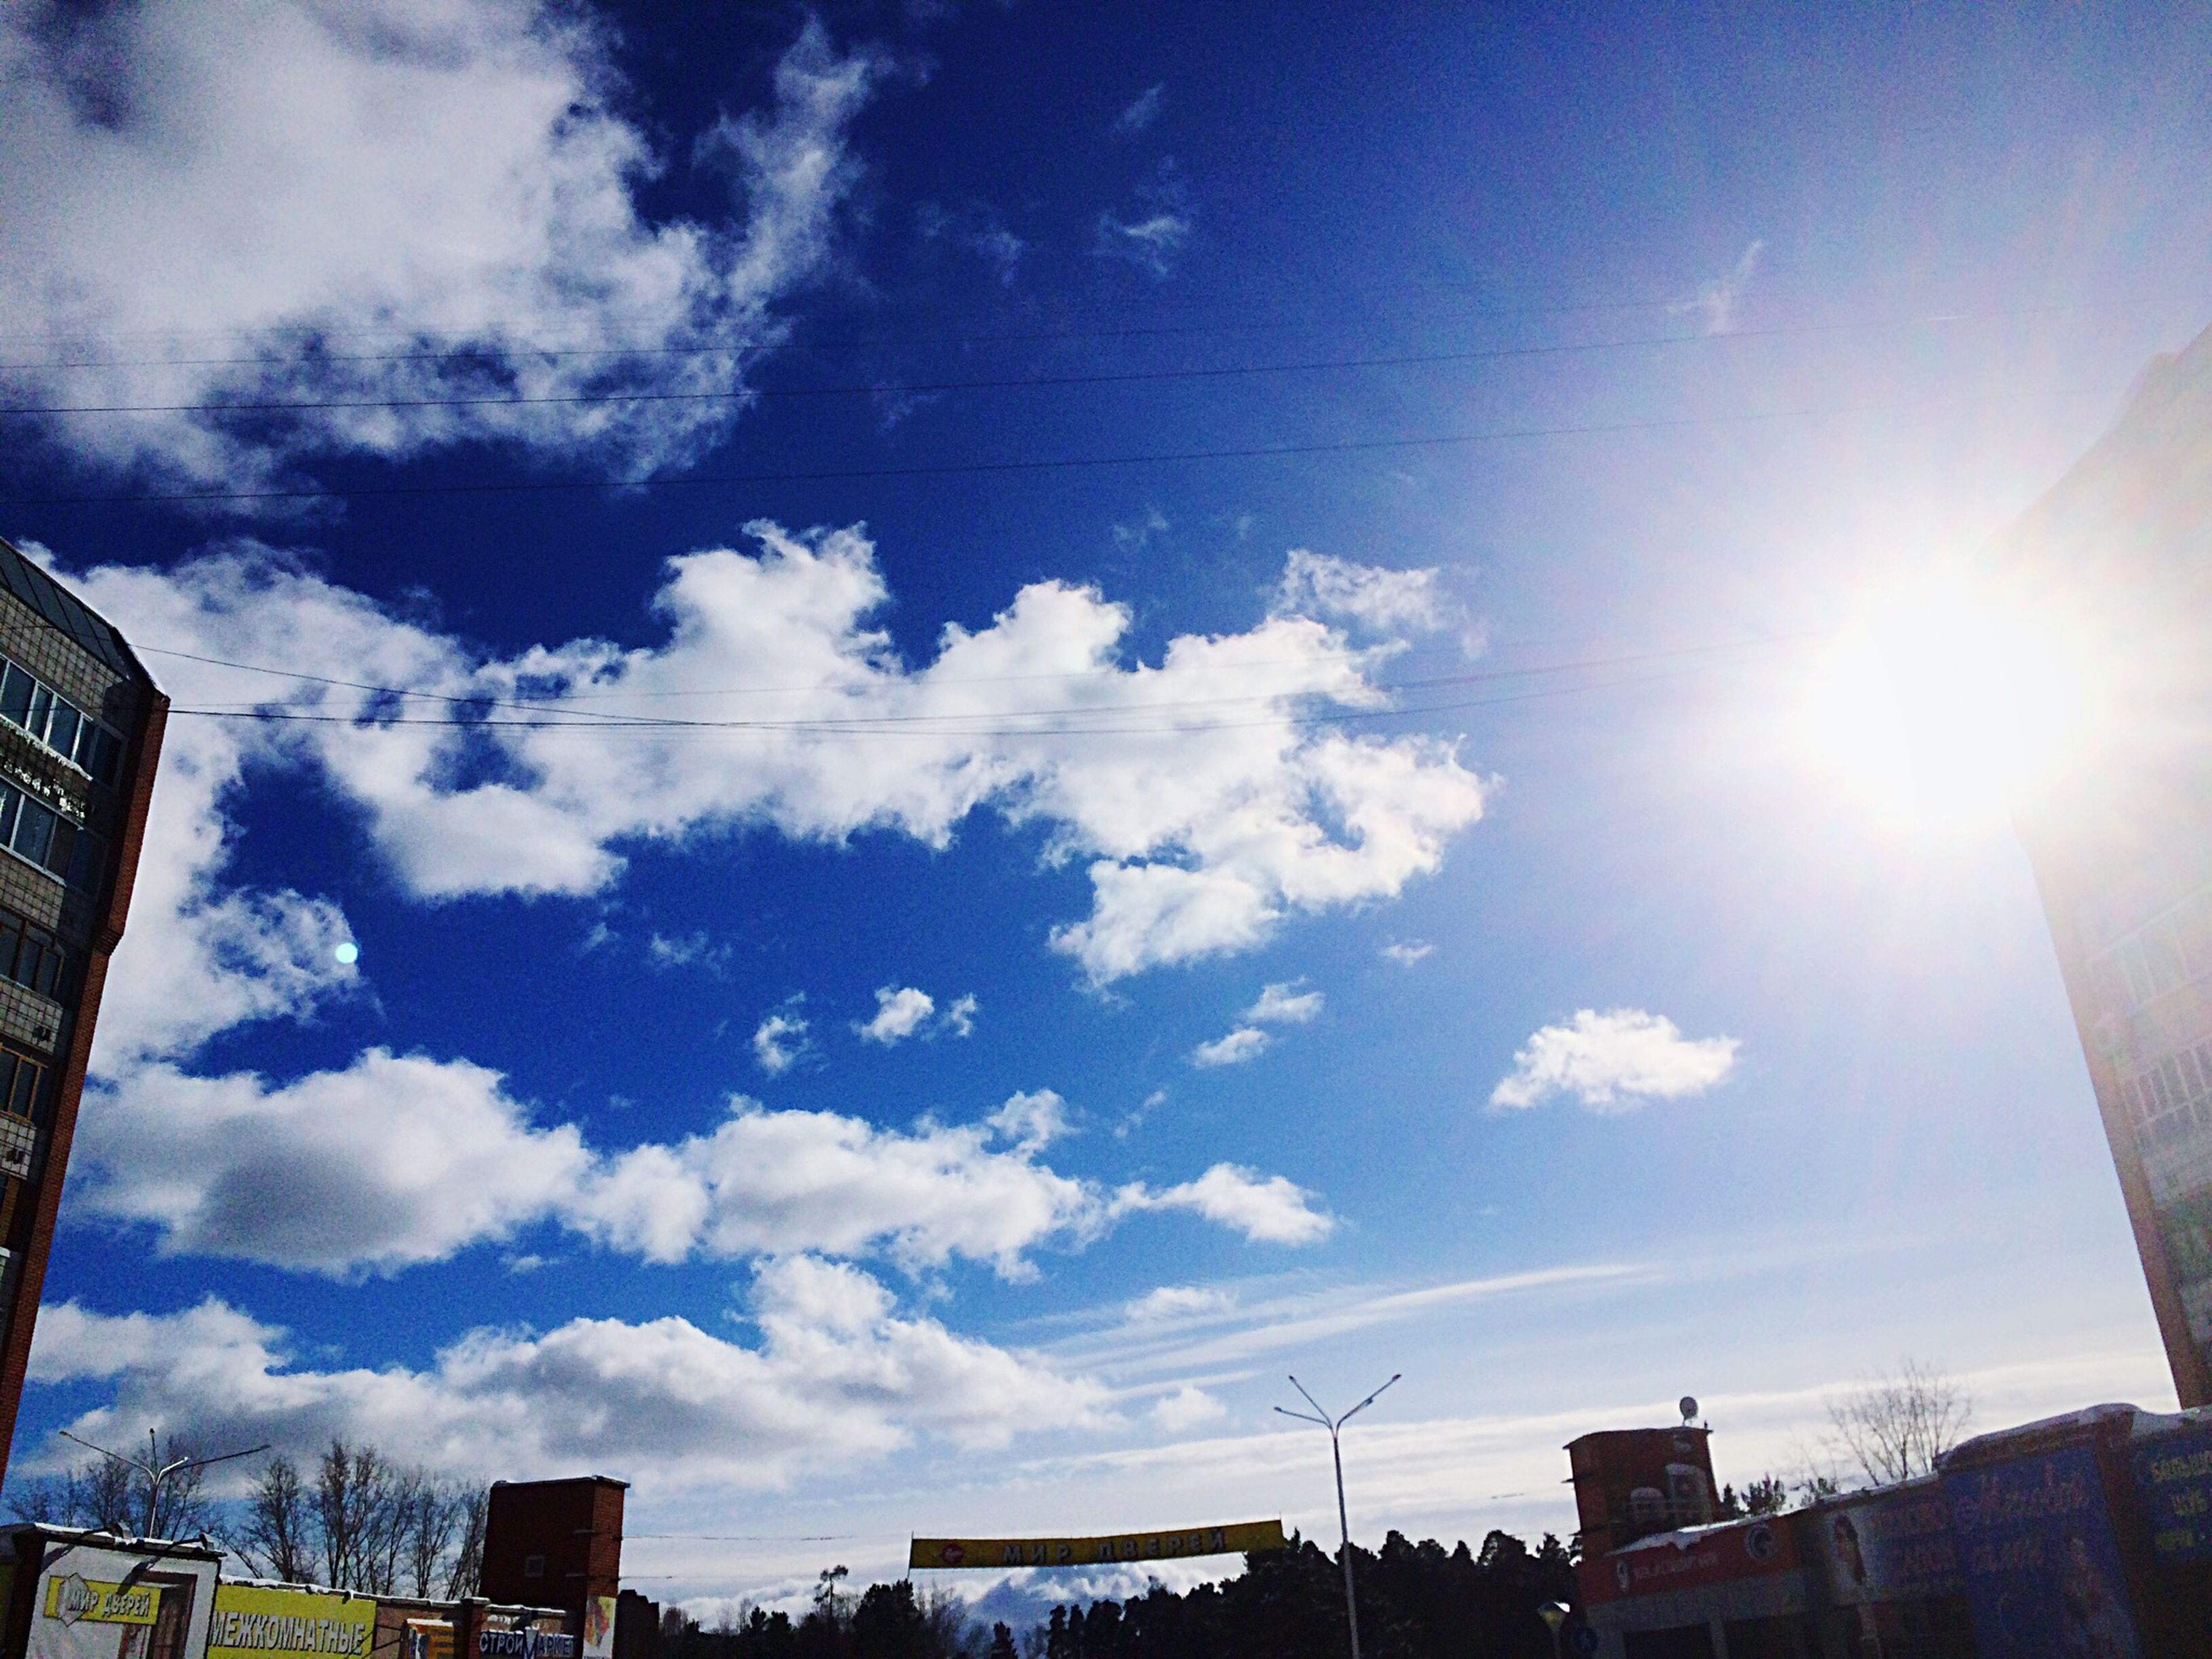 building exterior, architecture, built structure, sun, sunbeam, low angle view, sky, sunlight, city, lens flare, cloud - sky, blue, sunny, building, cloud, bright, skyscraper, day, outdoors, vapor trail